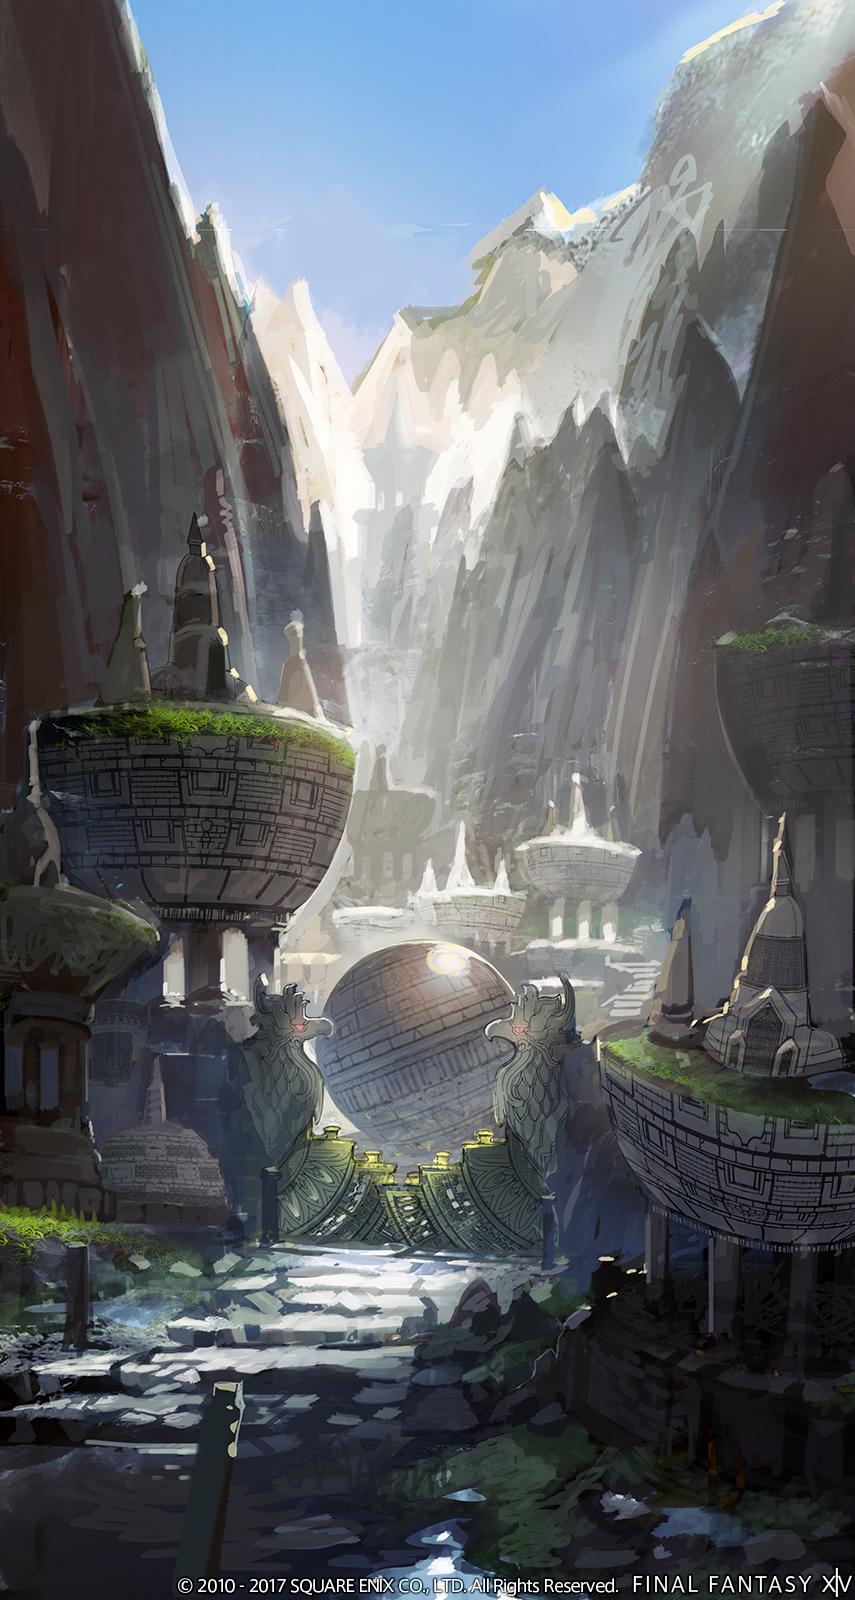 Final Fantasy XIV: Stormblood Image 6